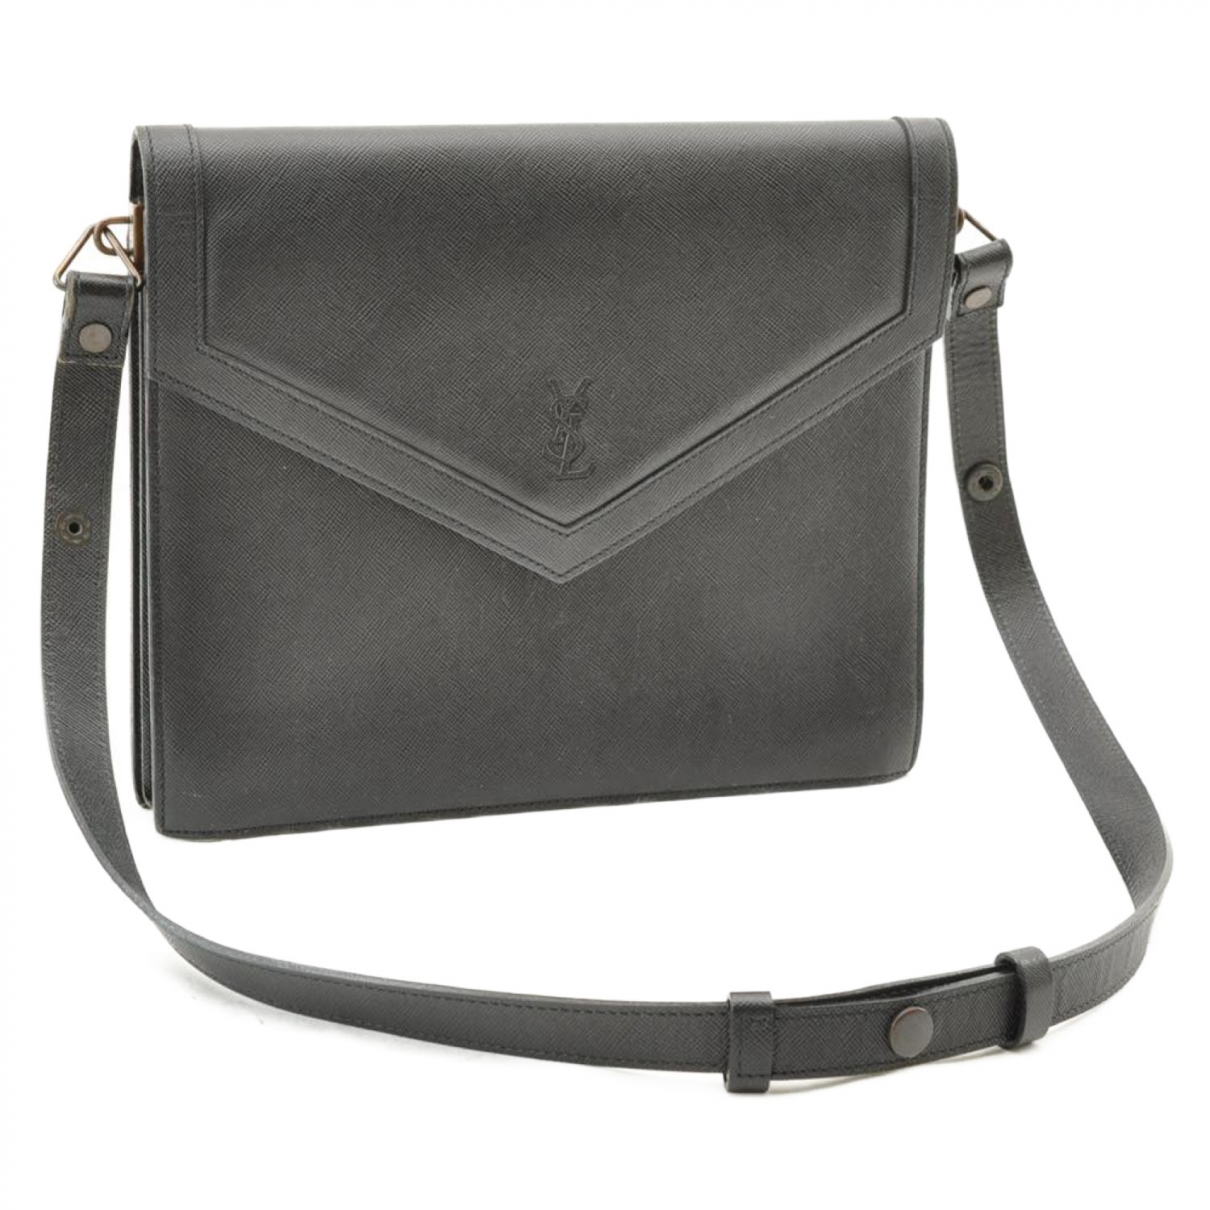 Yves Saint Laurent \N Handtasche in  Schwarz Leinen